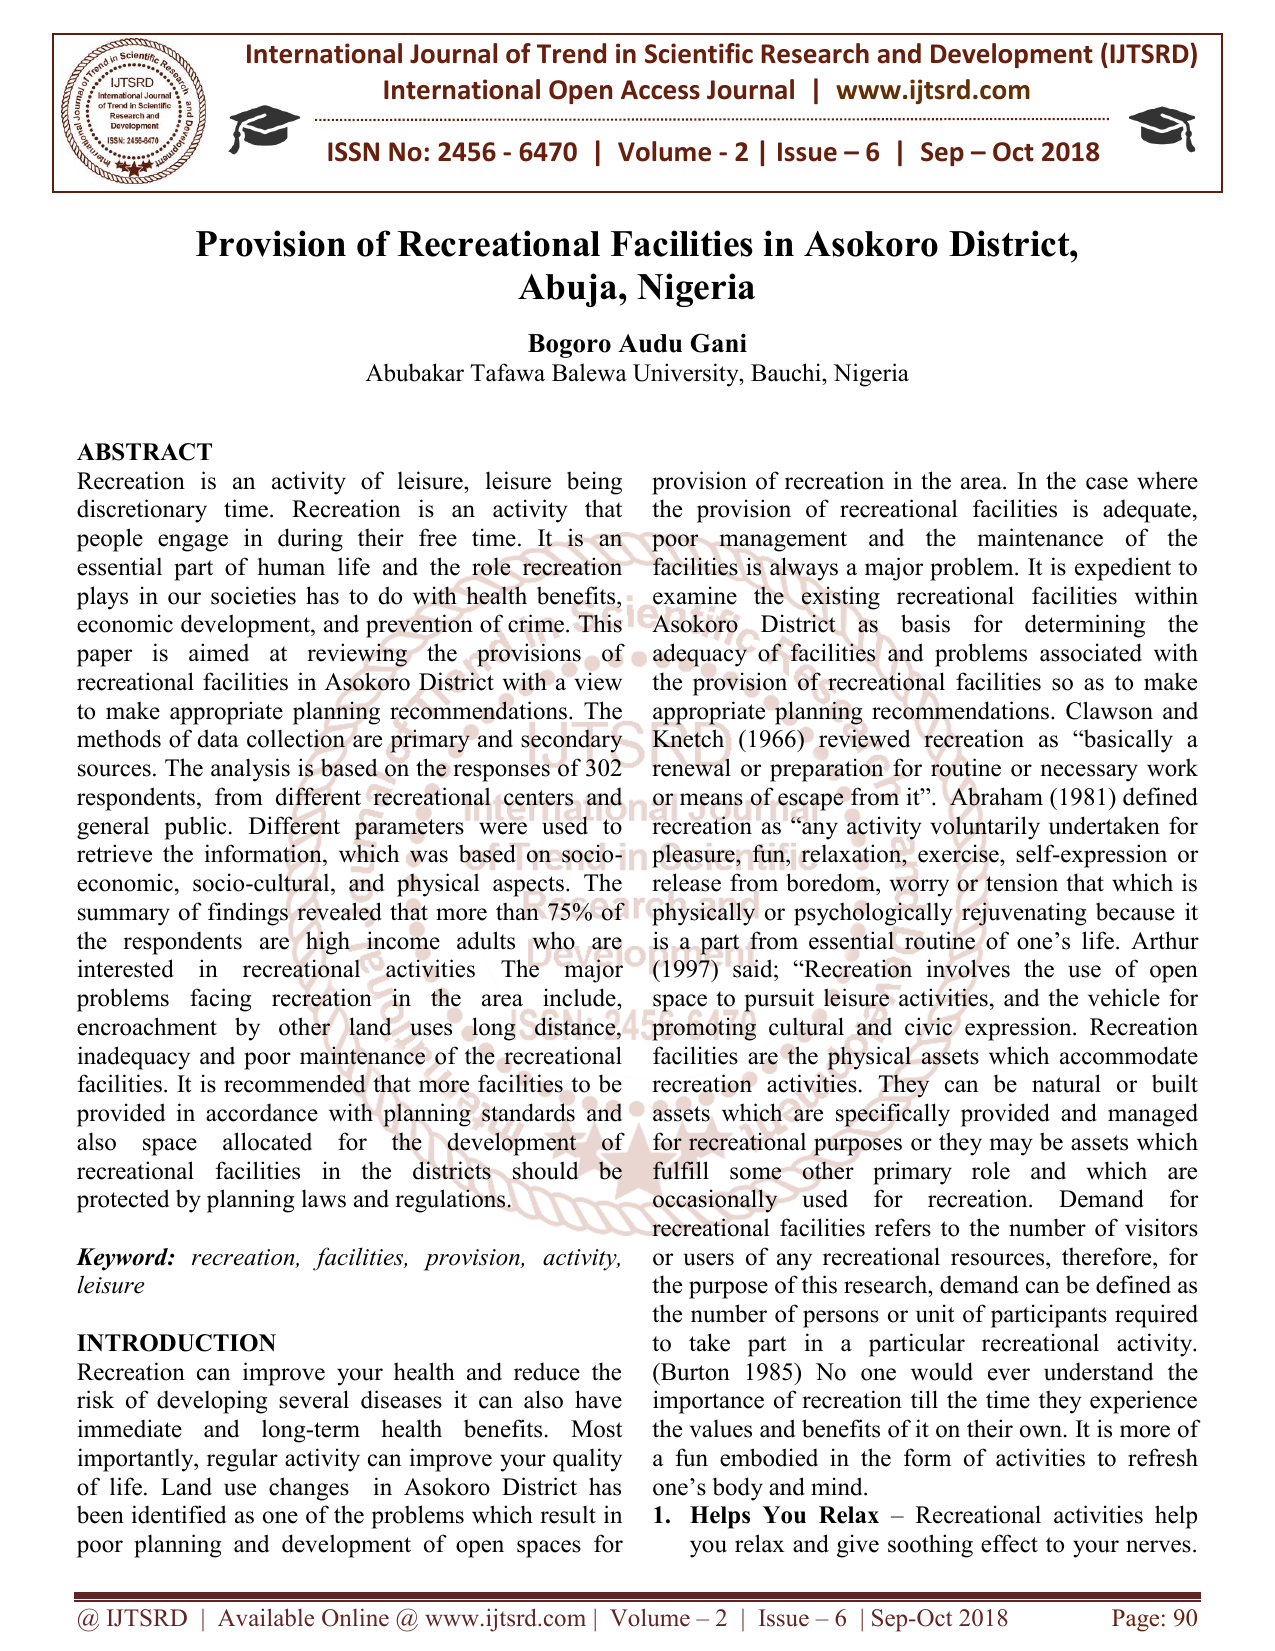 Provision Of Recreational Facilities In Asokoro District Abuja Nigeria